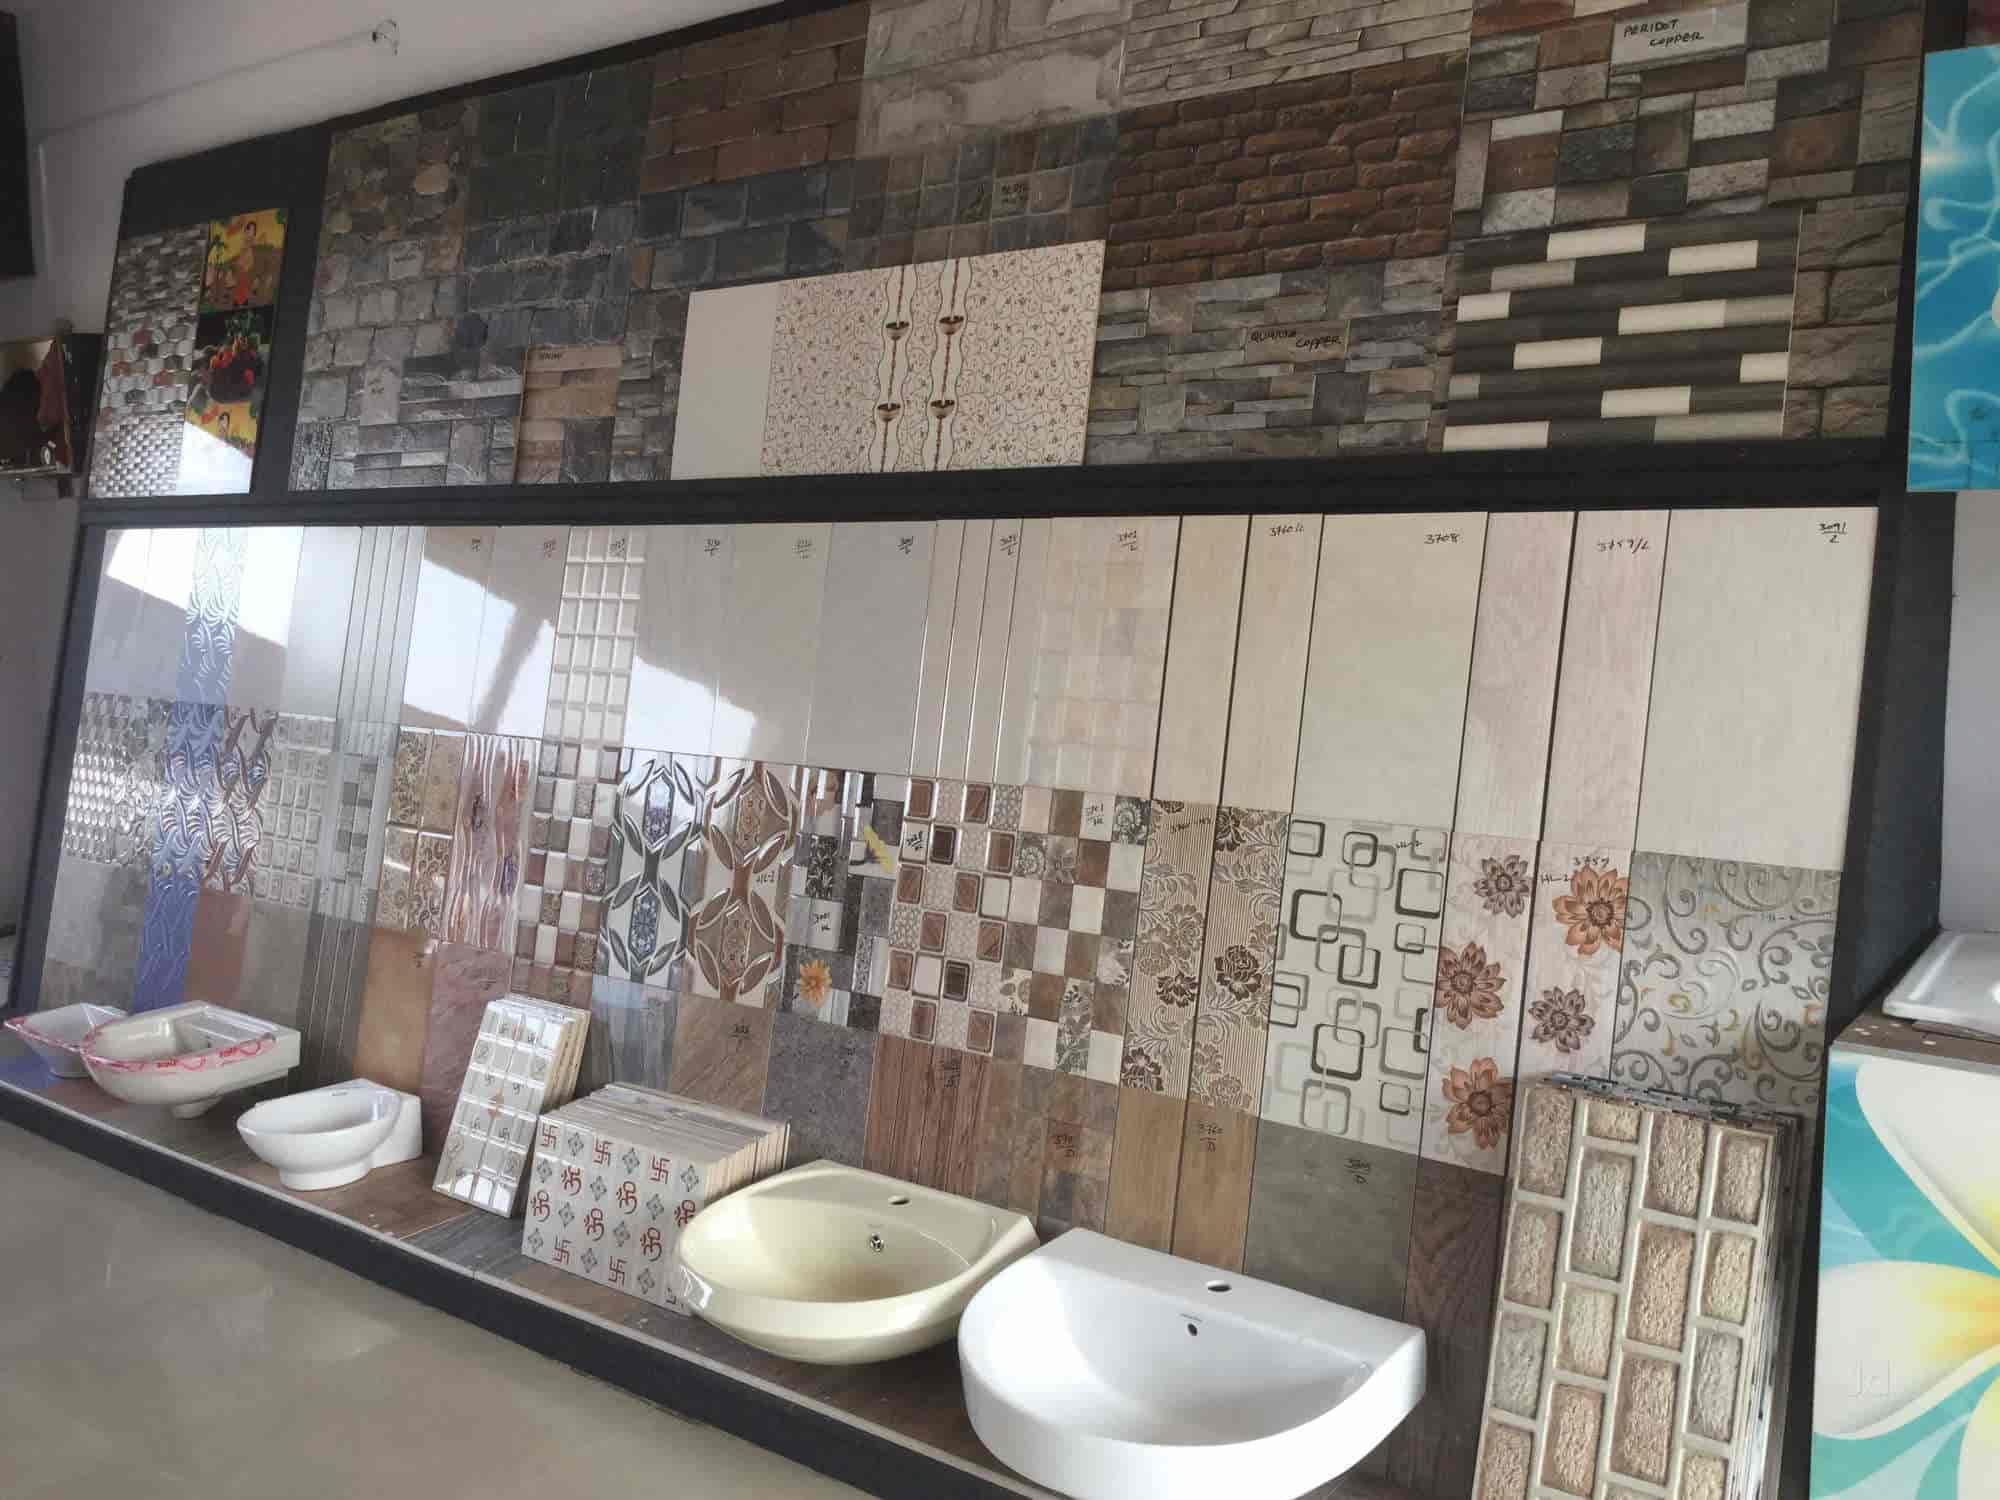 SVS Tile Shop, Chanda Nagar - Plumbers in Hyderabad - Justdial